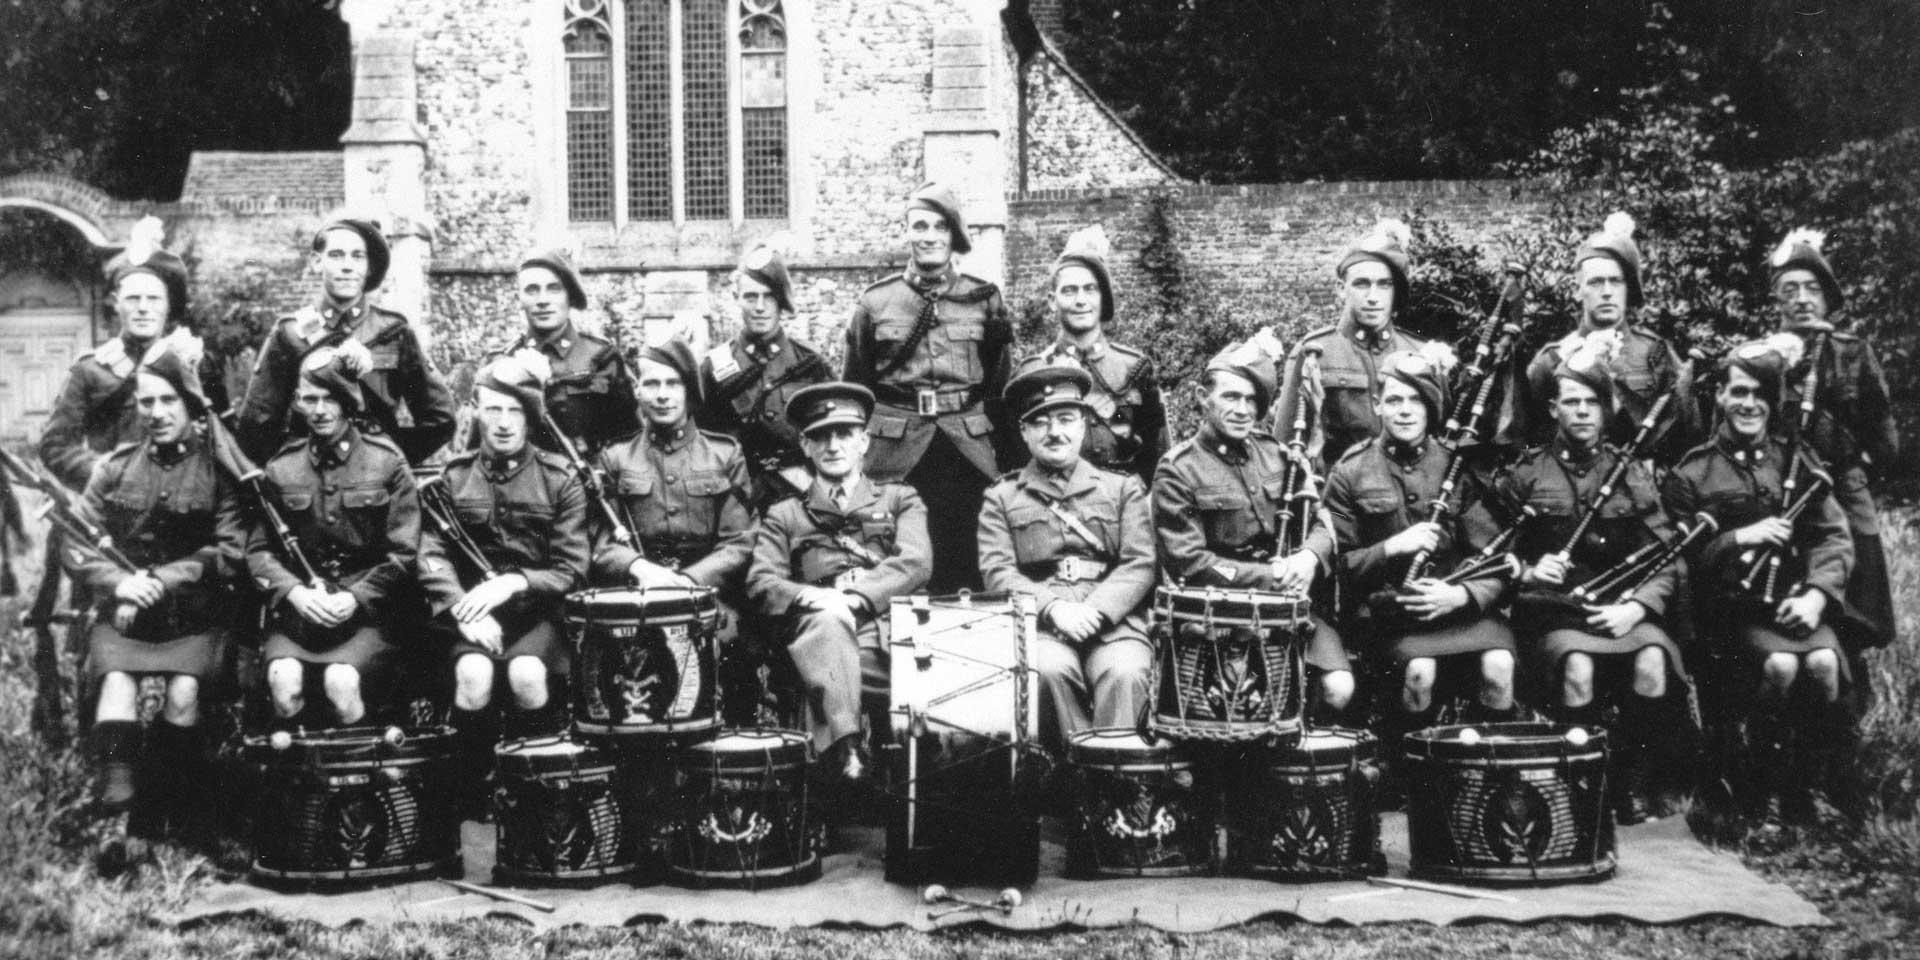 Bandsmen of The Royal Ulster Rifles, c1941